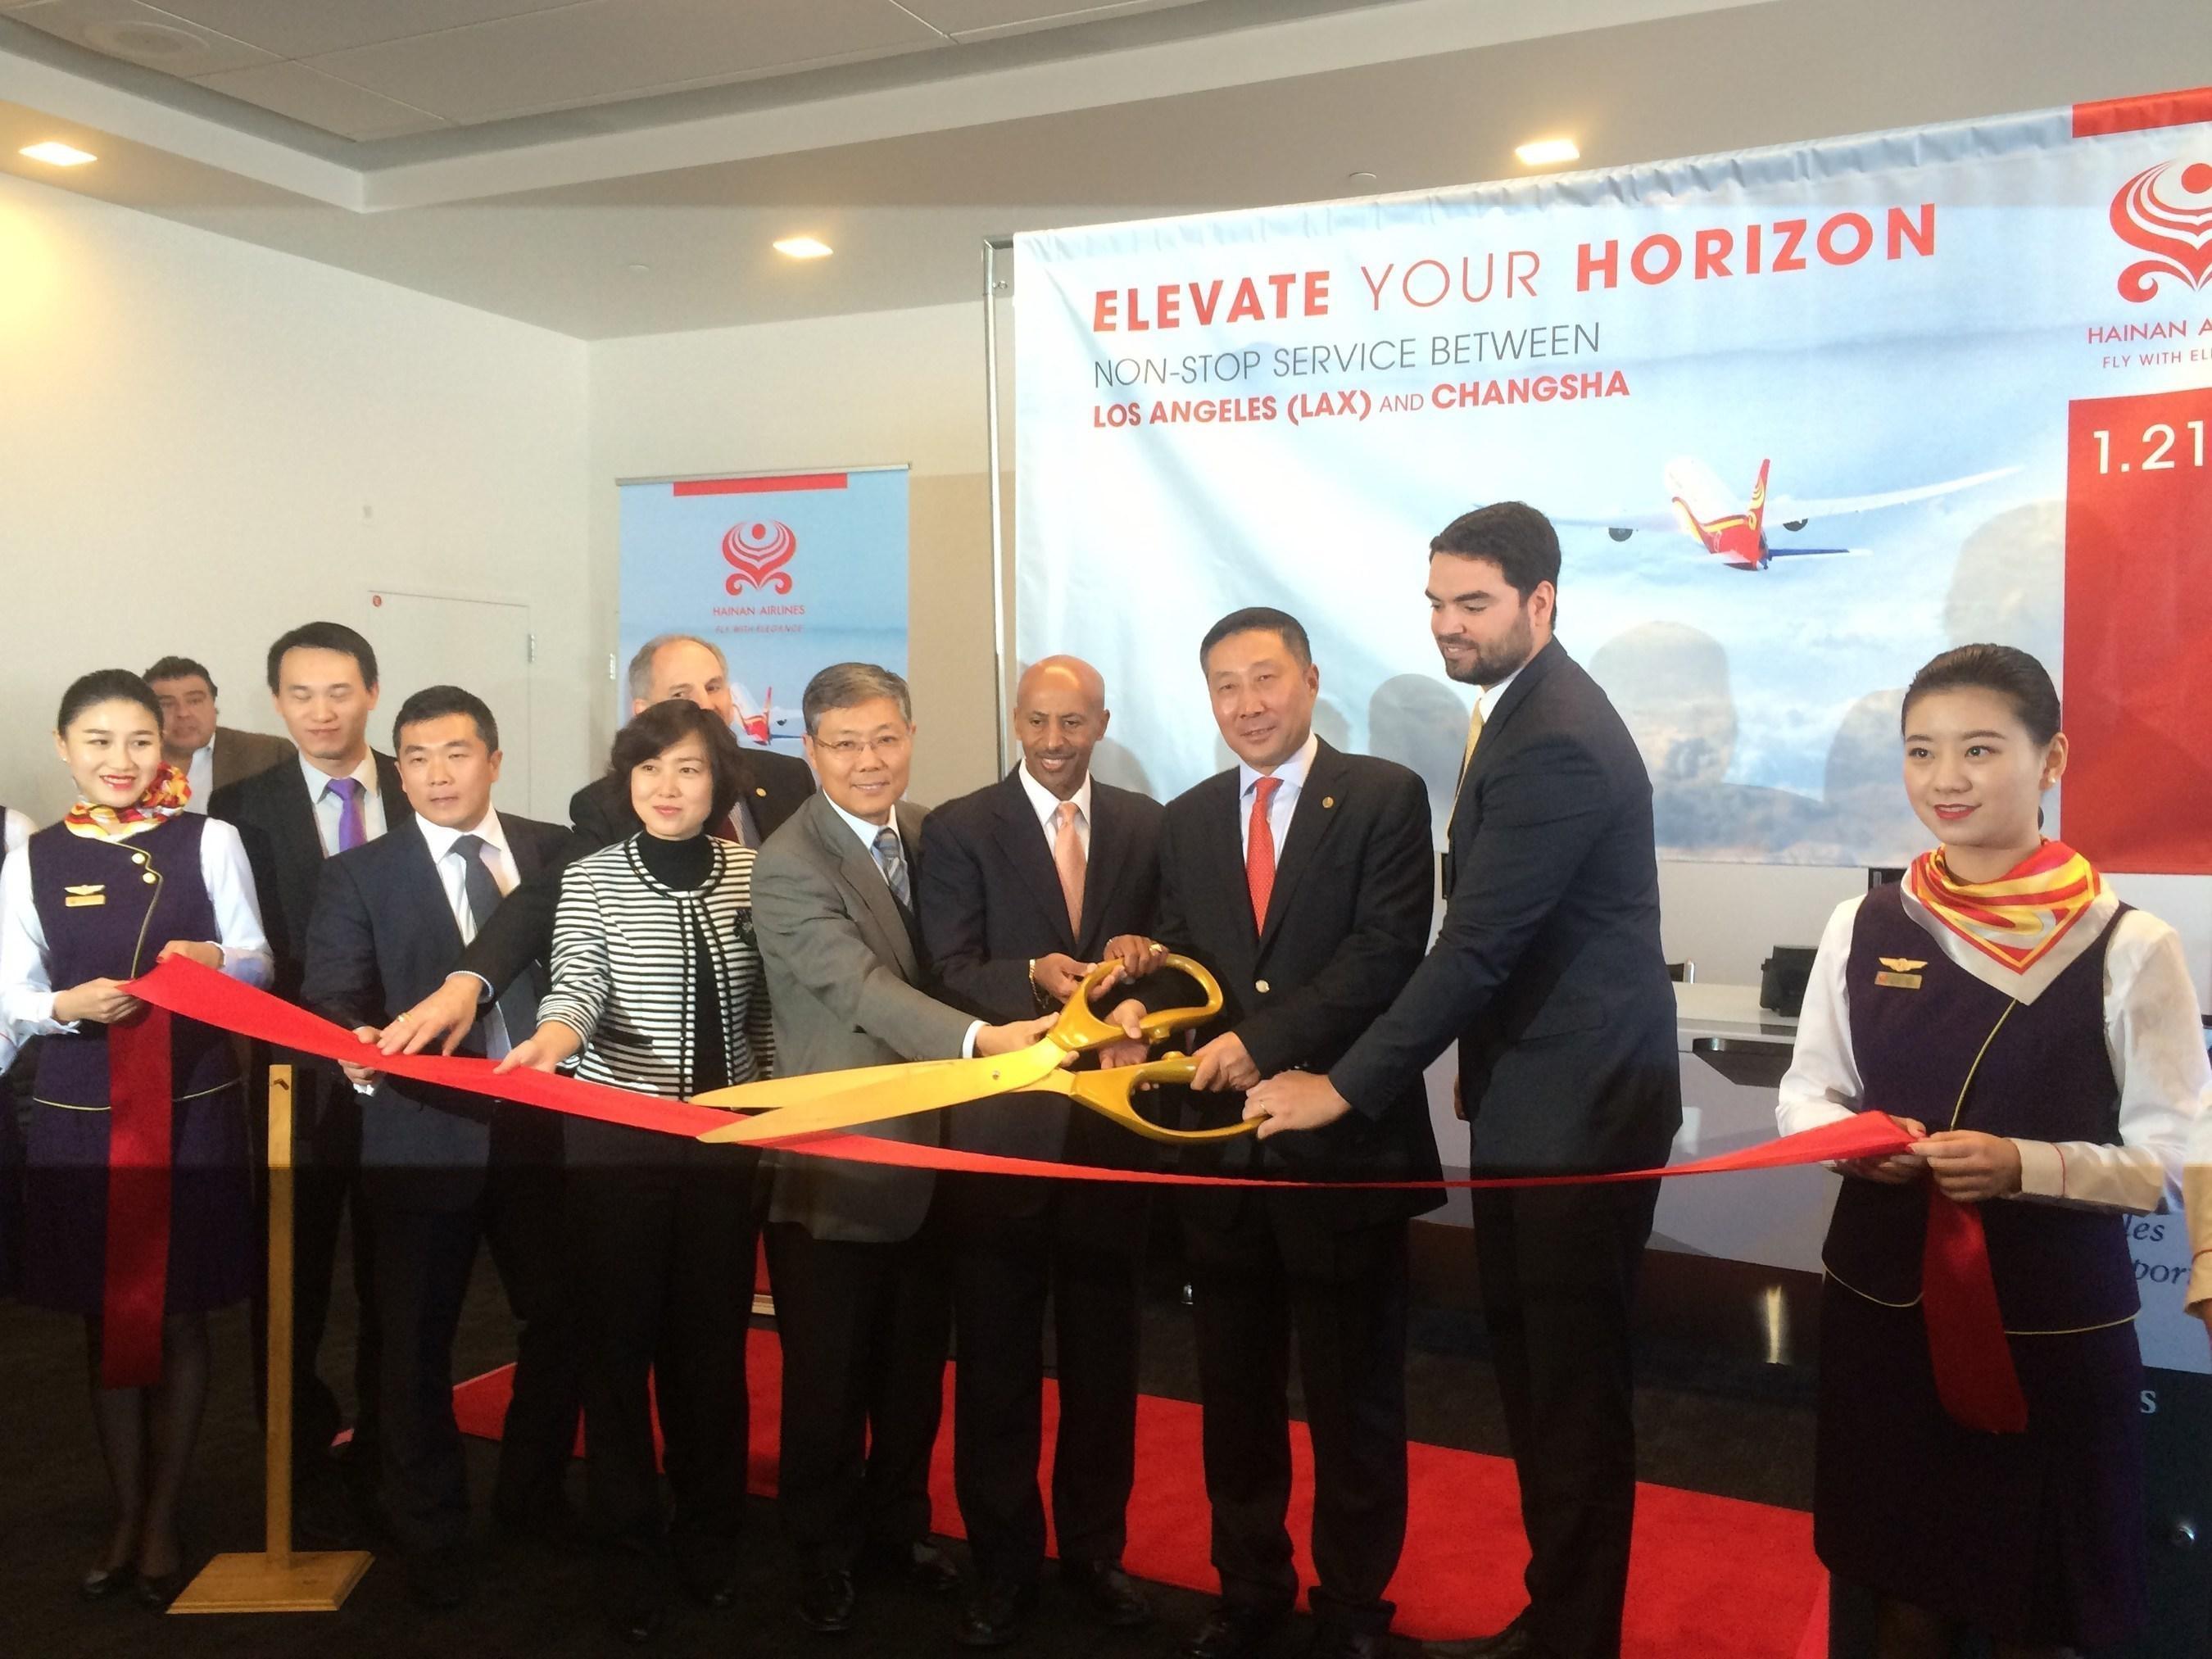 Hainan Airlines startet am 21. Januar Verbindung Changsha-Los Angeles